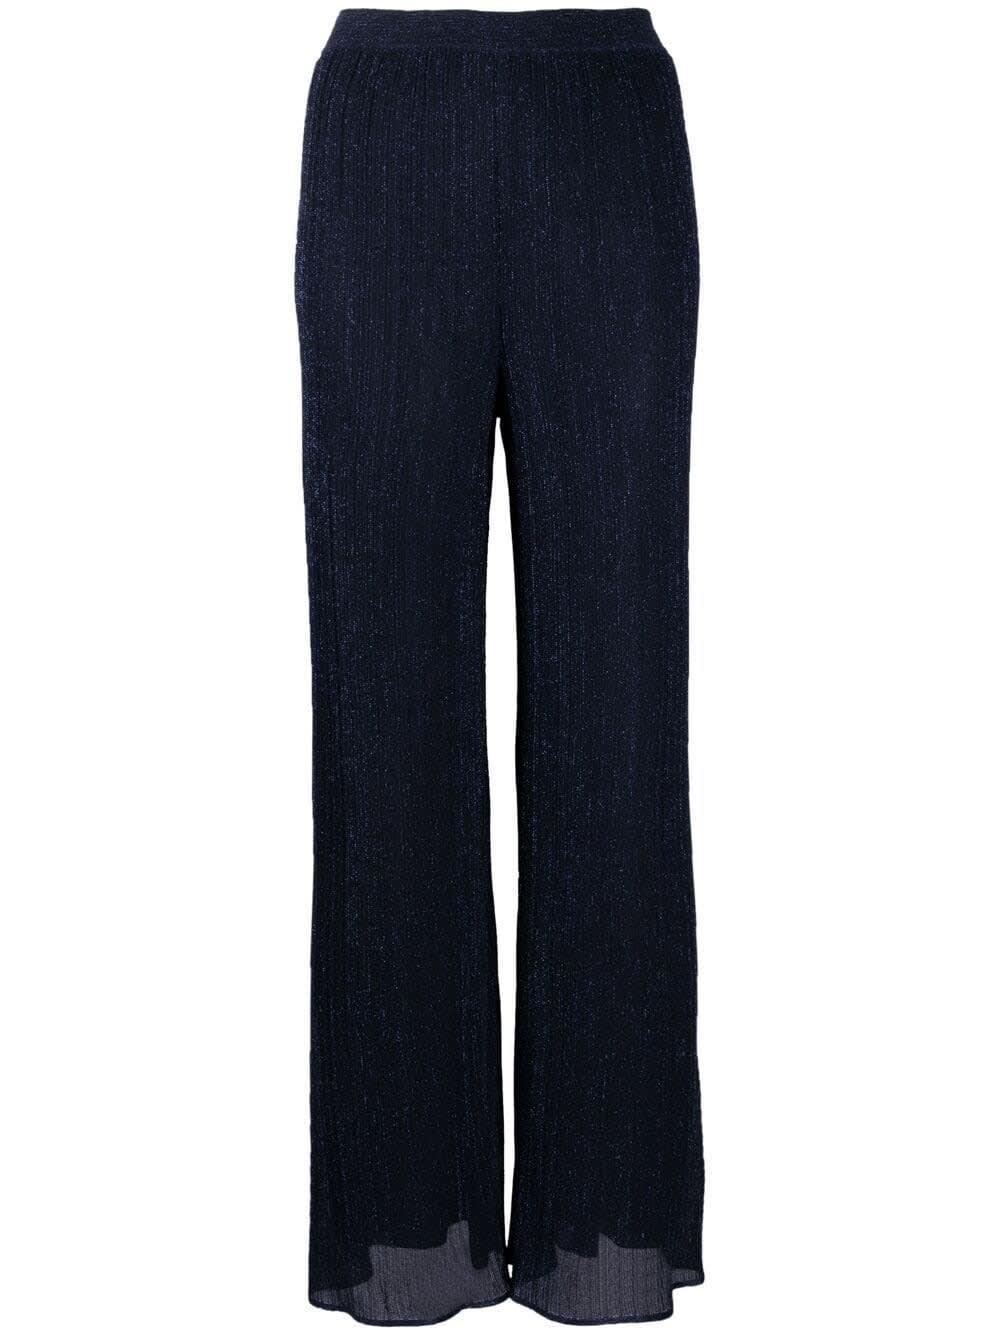 M Missoni Pants VISCOSE PANTS IN BLUE LUREX